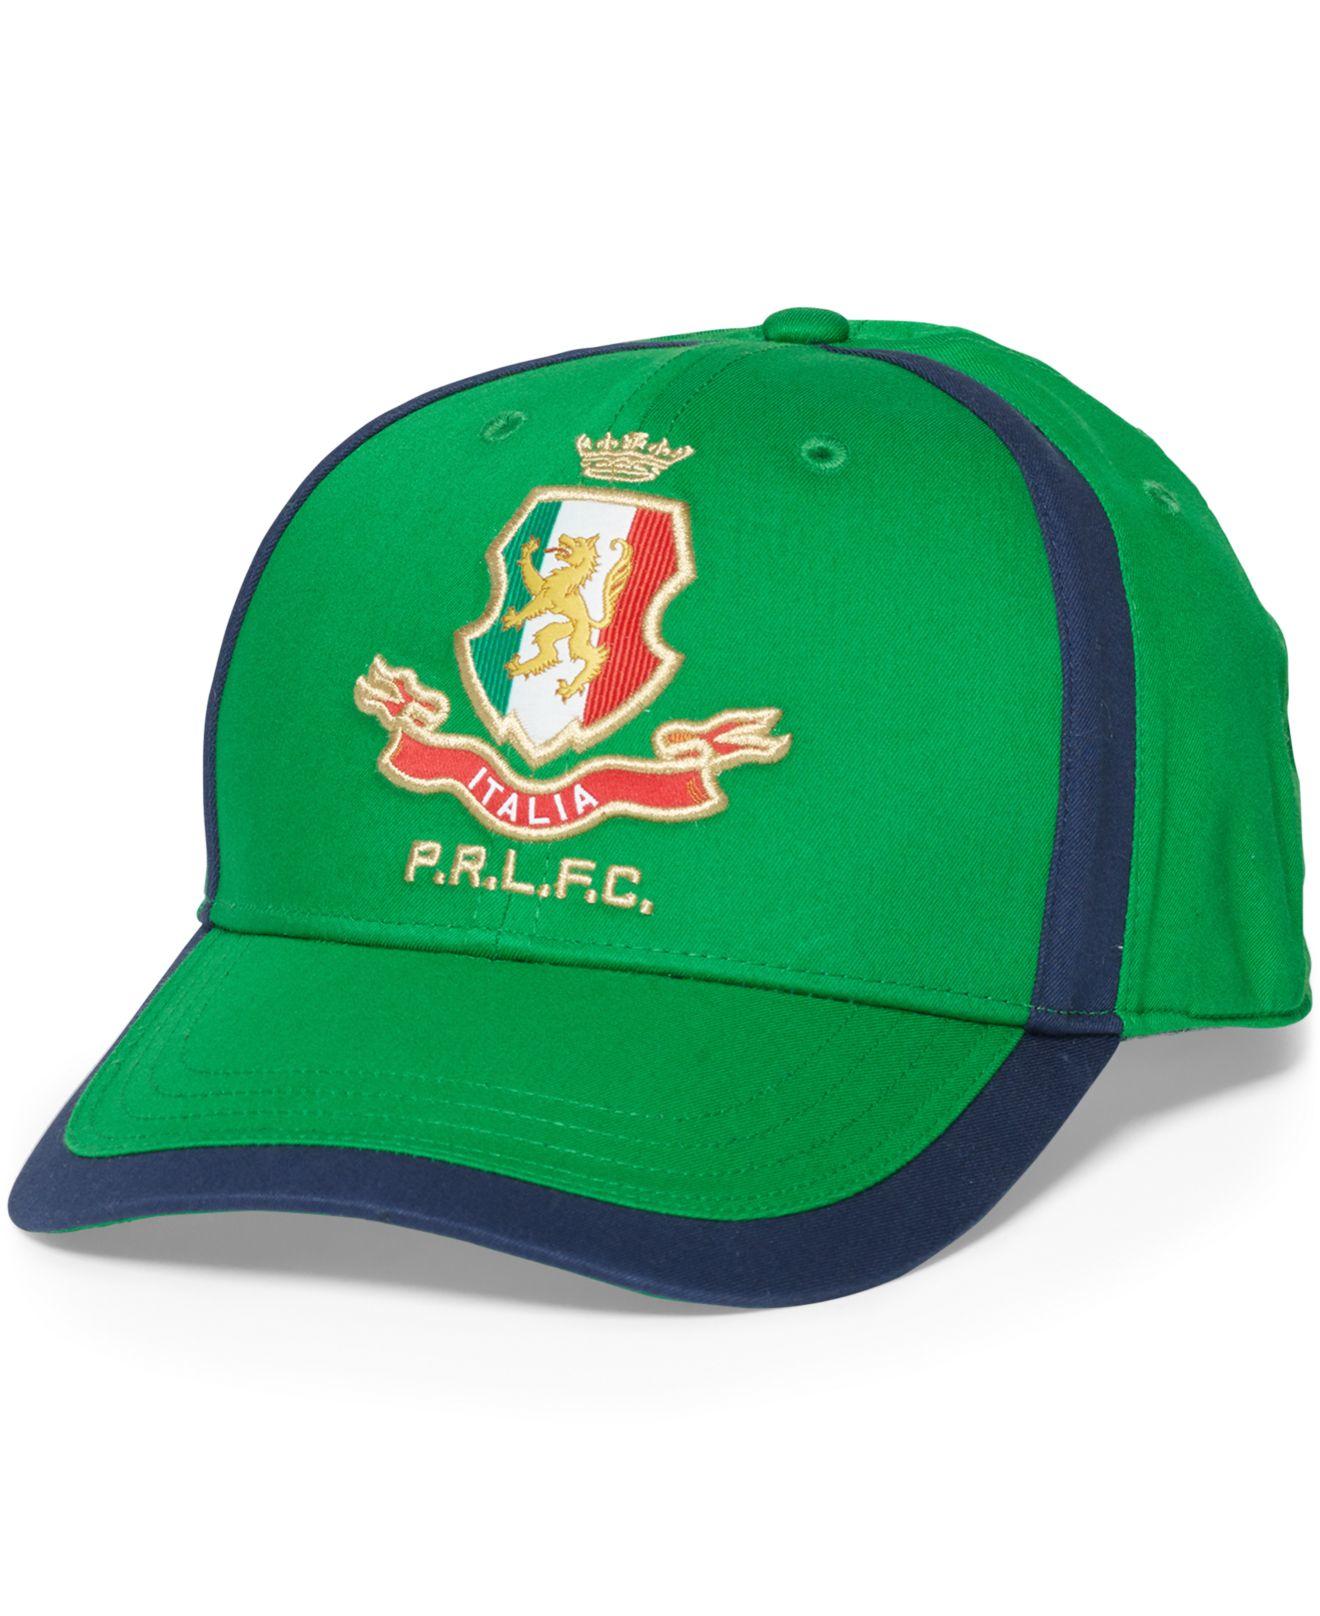 55dbd1b7 Polo Ralph Lauren Polo Sport Italia Baseline Hat in Green for Men - Lyst